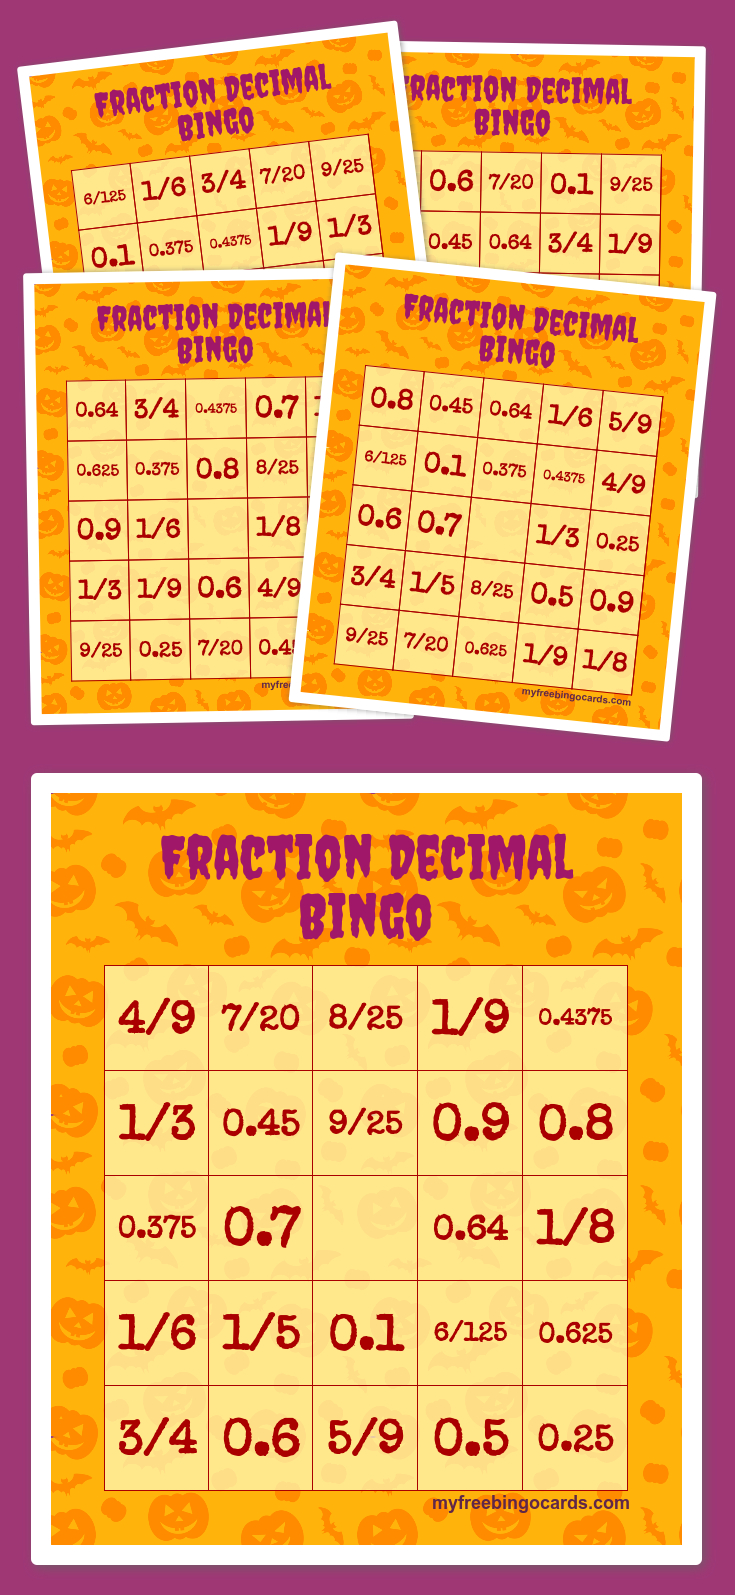 Fraction Decimal Bingo | Halloween Bingo Printable, Free